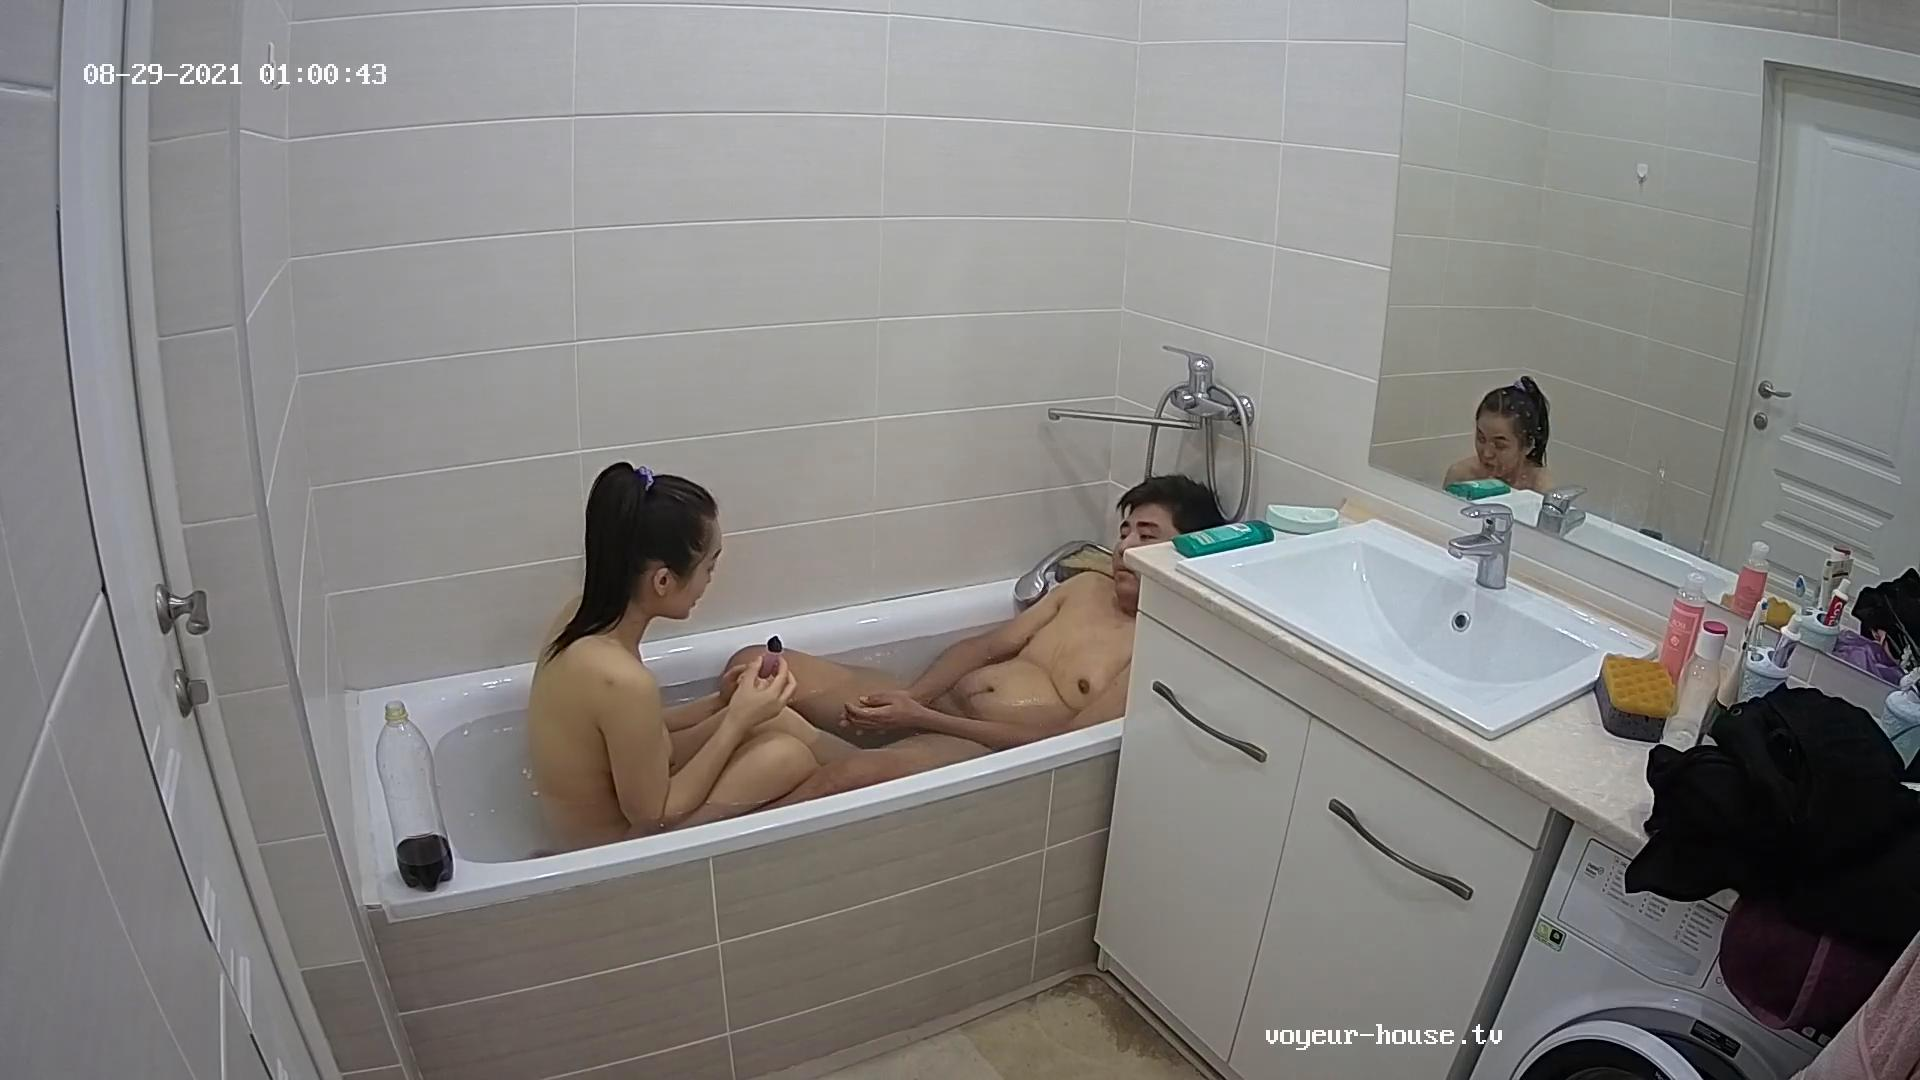 Guest Couple bath together 29 Aug 2021